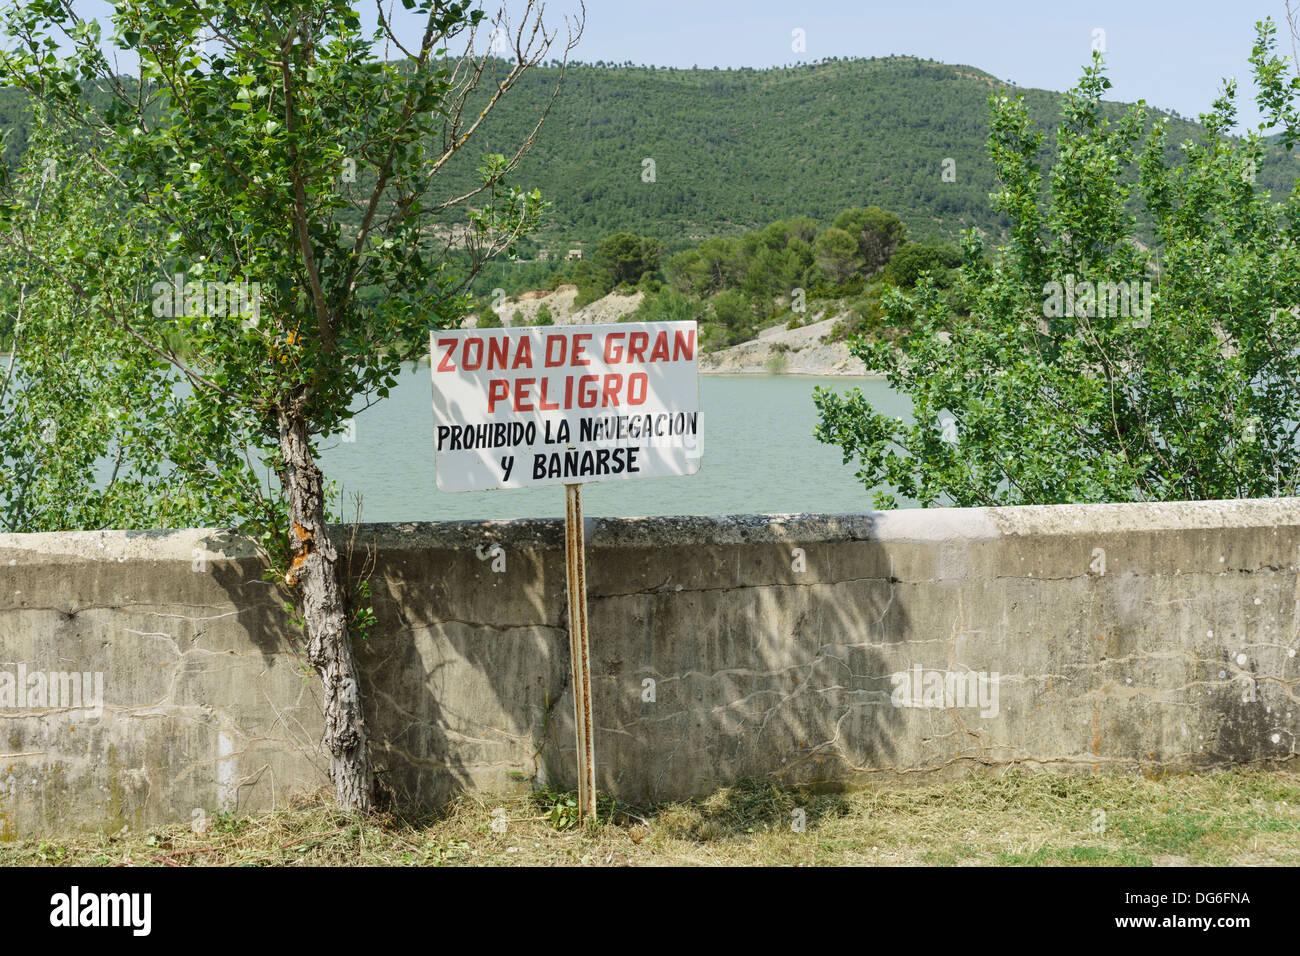 North-West Spain - Embalse de la Peña, dam north of Huesca. Danger no bathing sign. - Stock Image